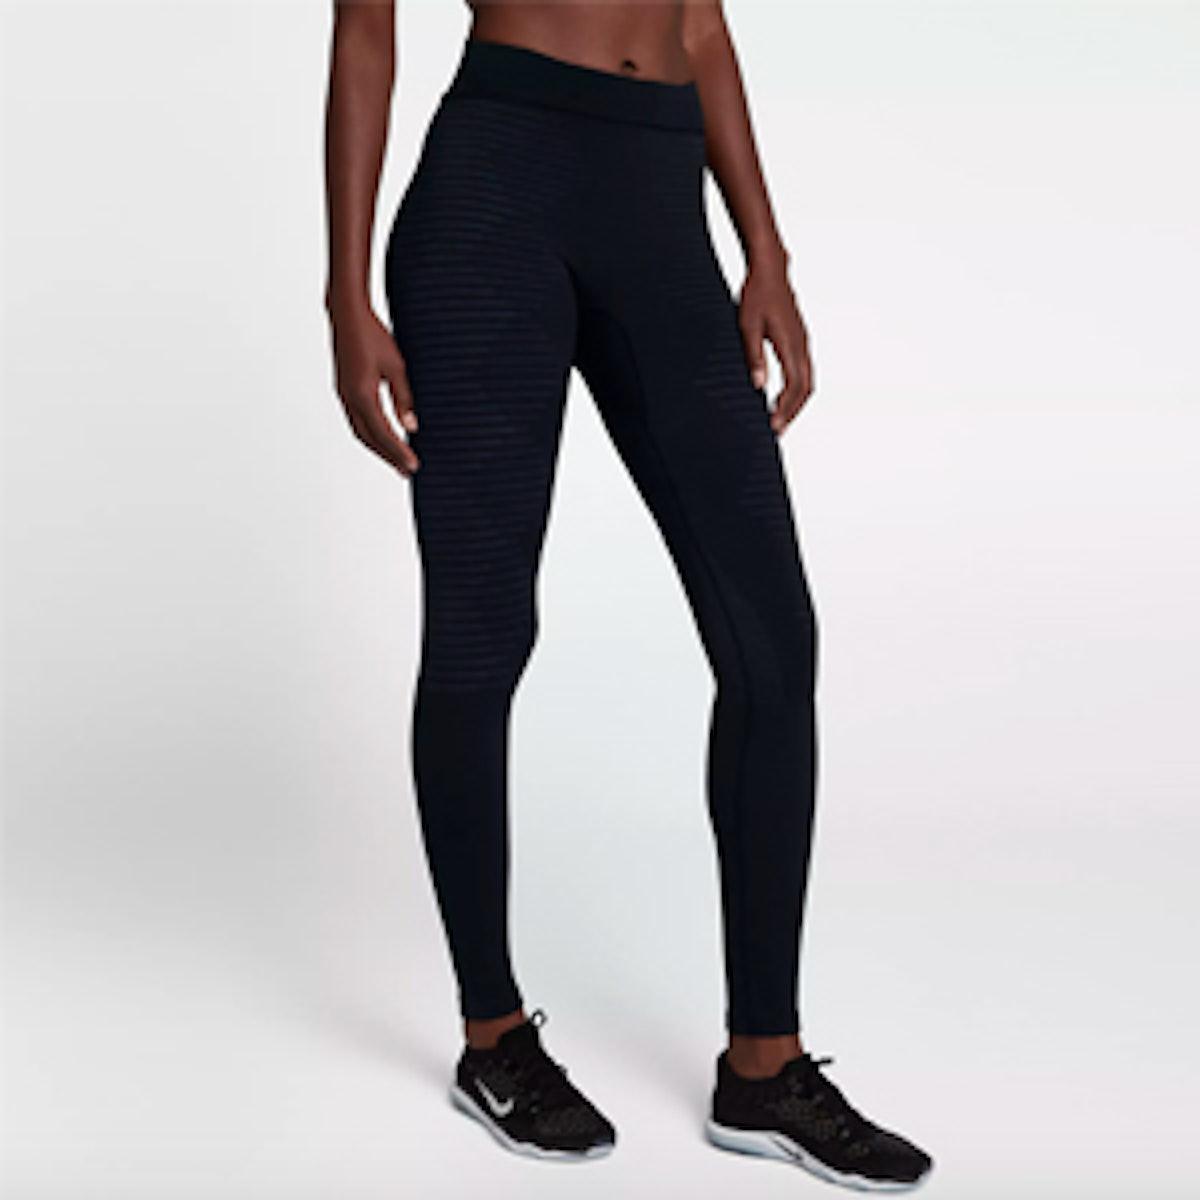 Pro Hyperwarm Leggings